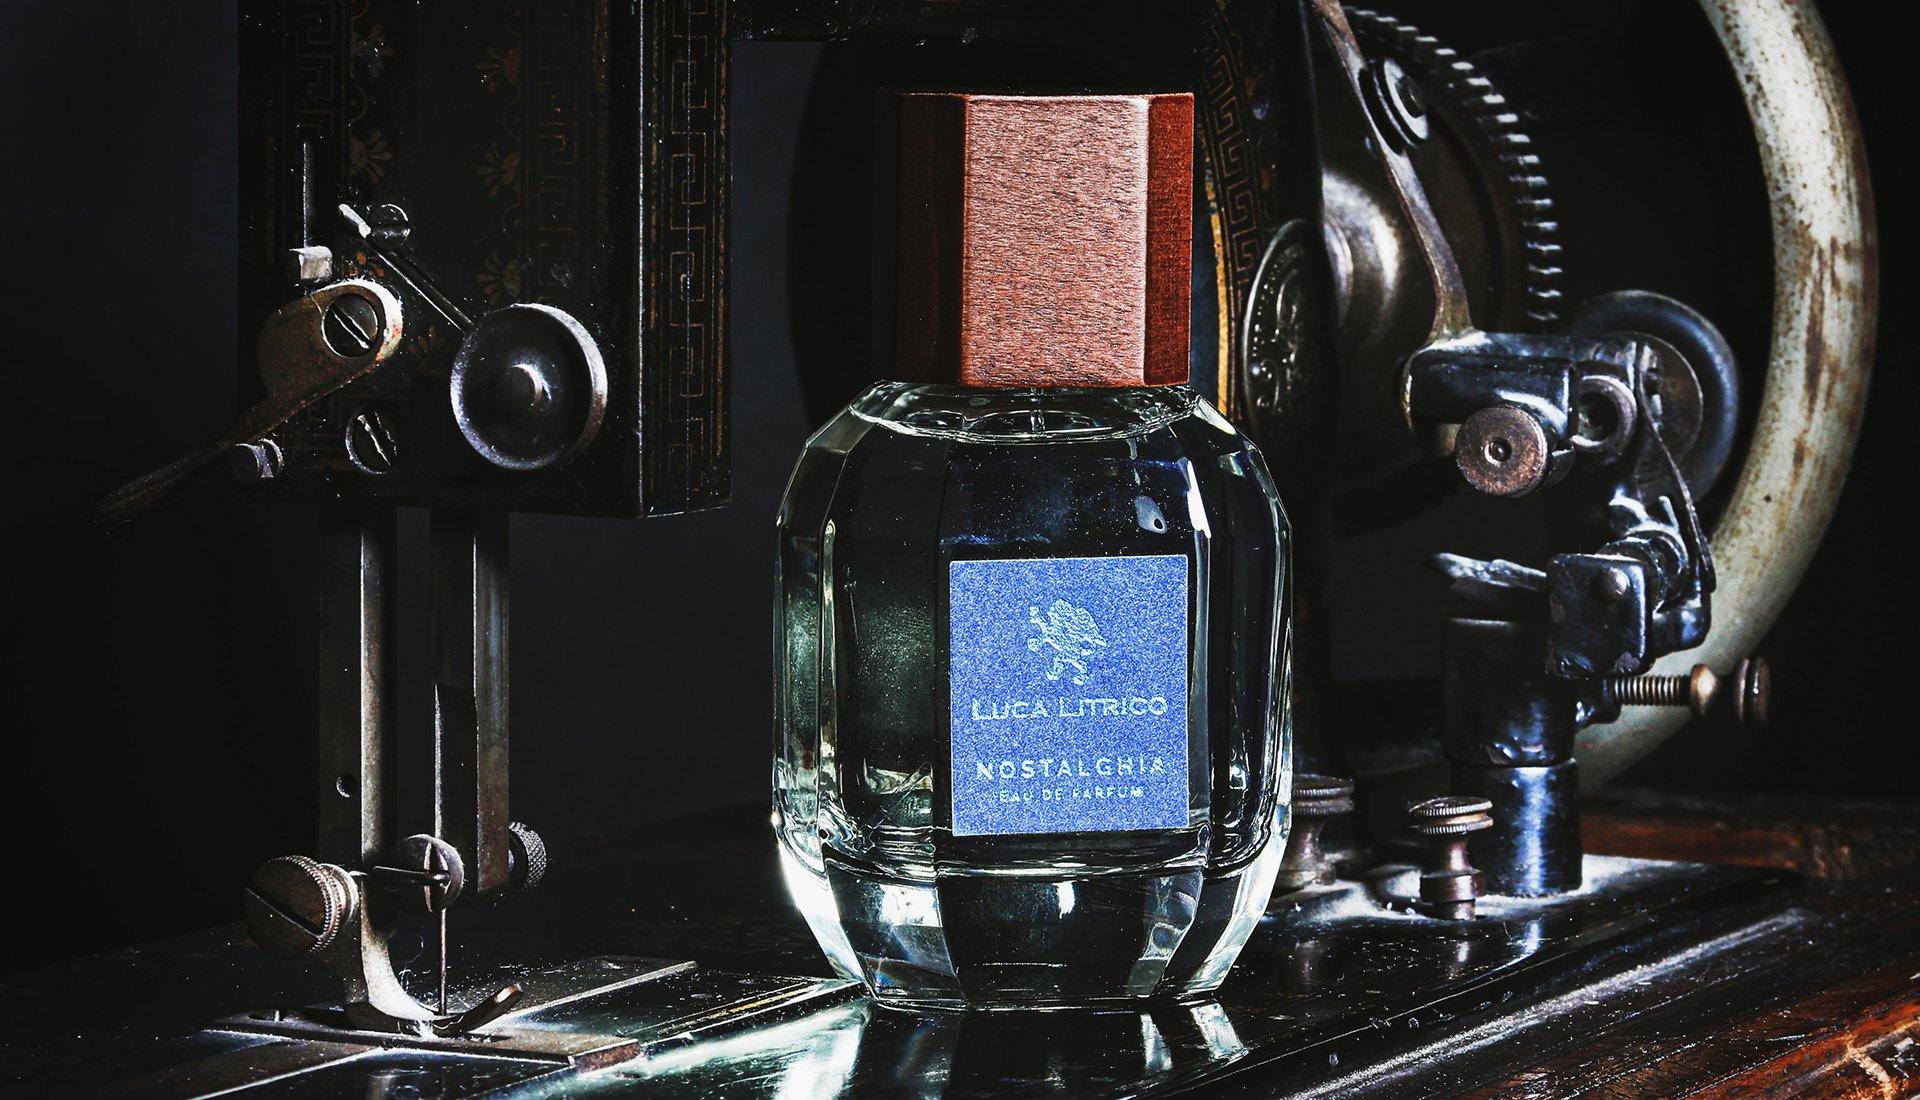 parfum - nostalghia - luca litrico